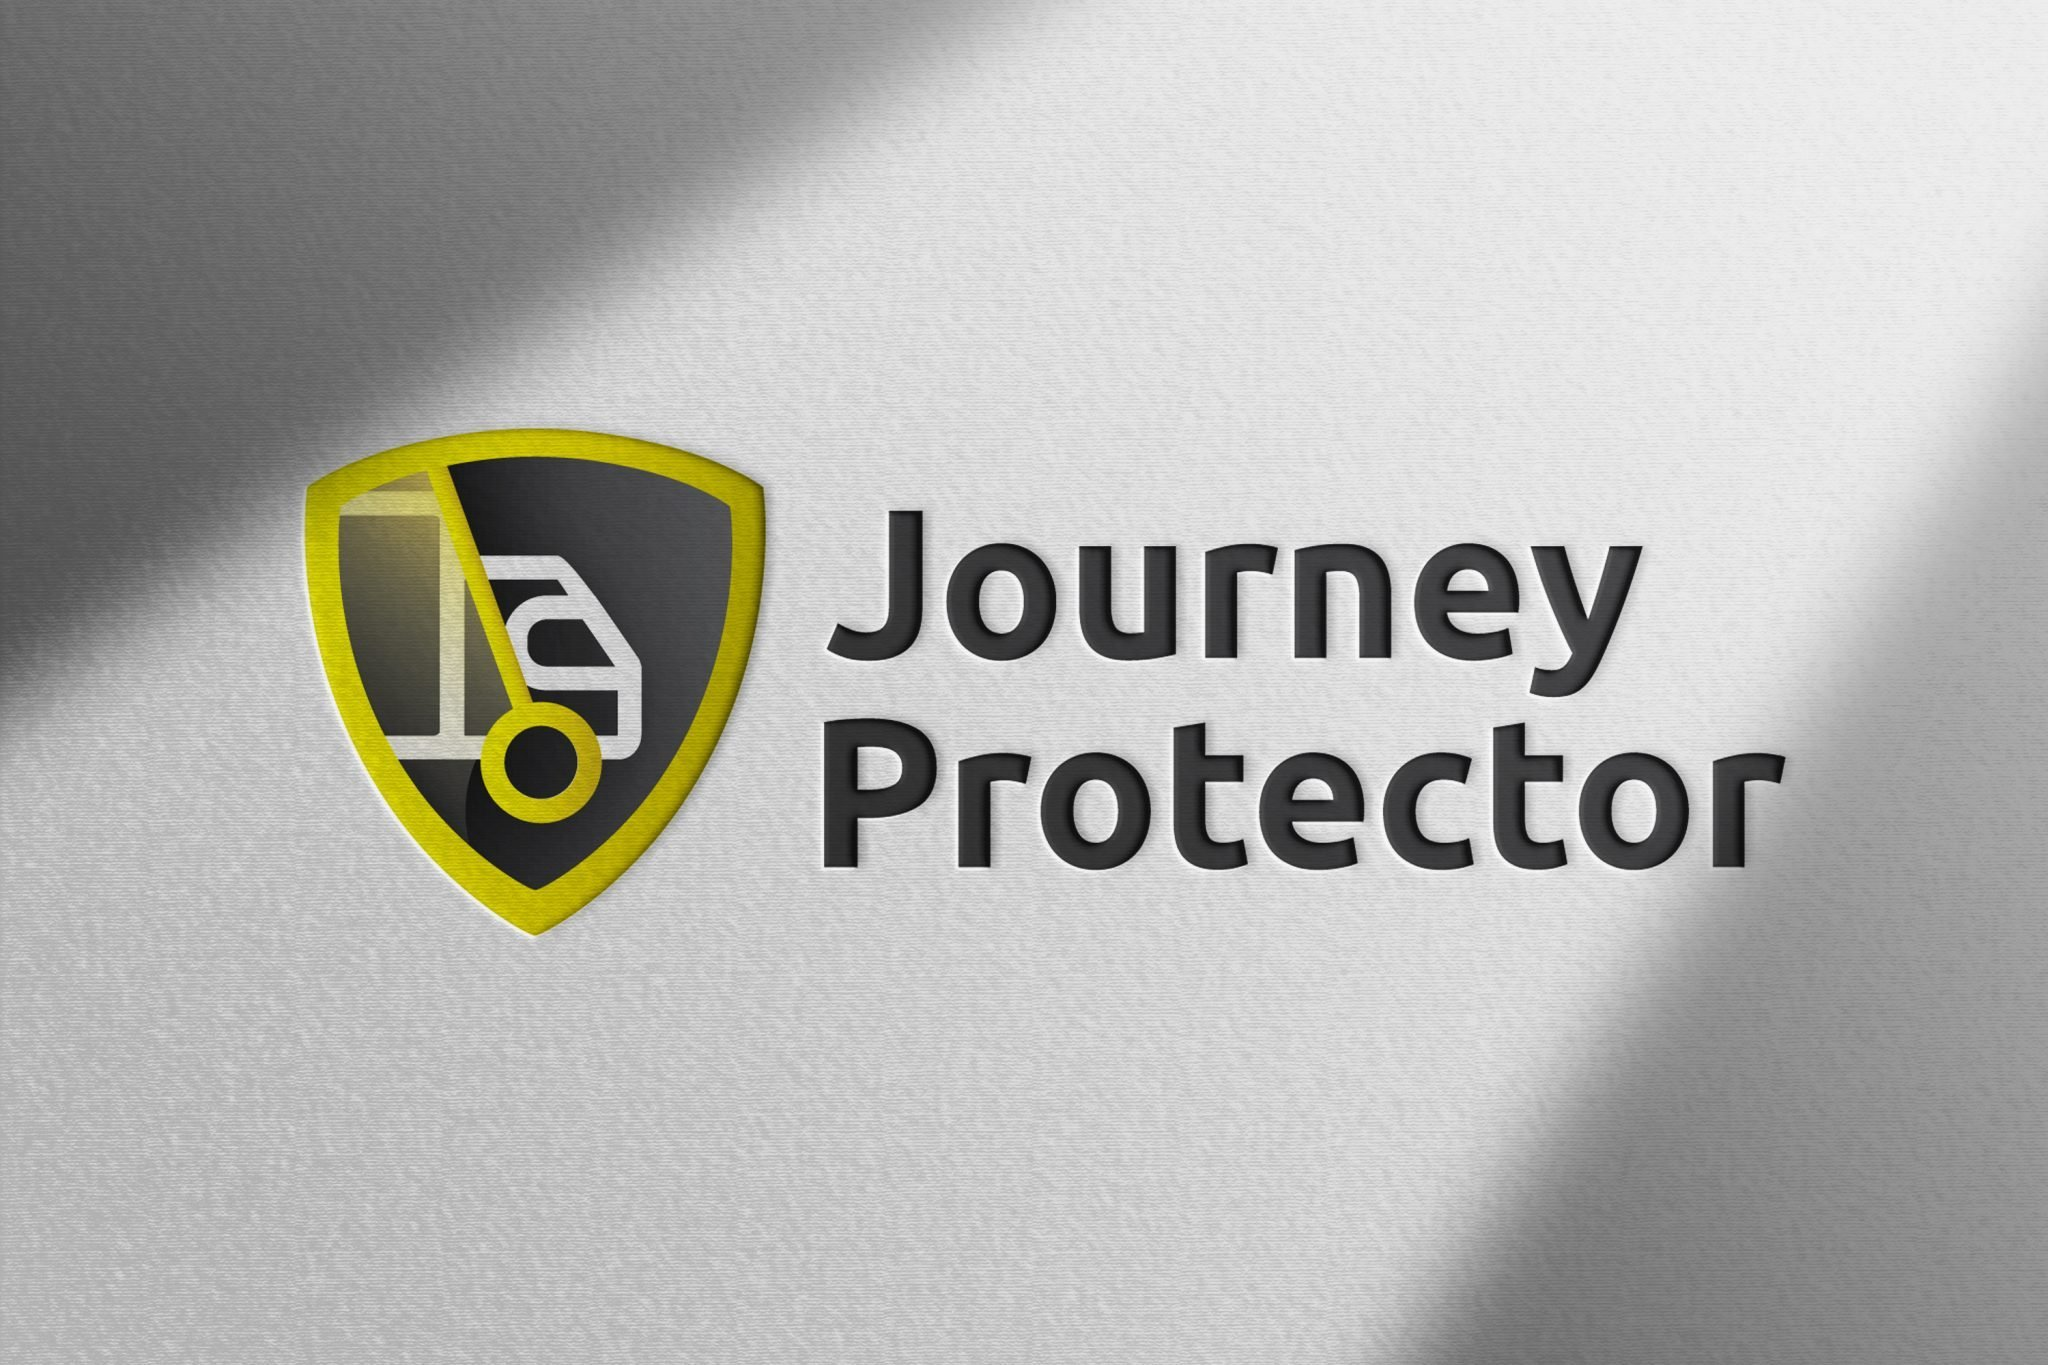 journey-protector-logo-design